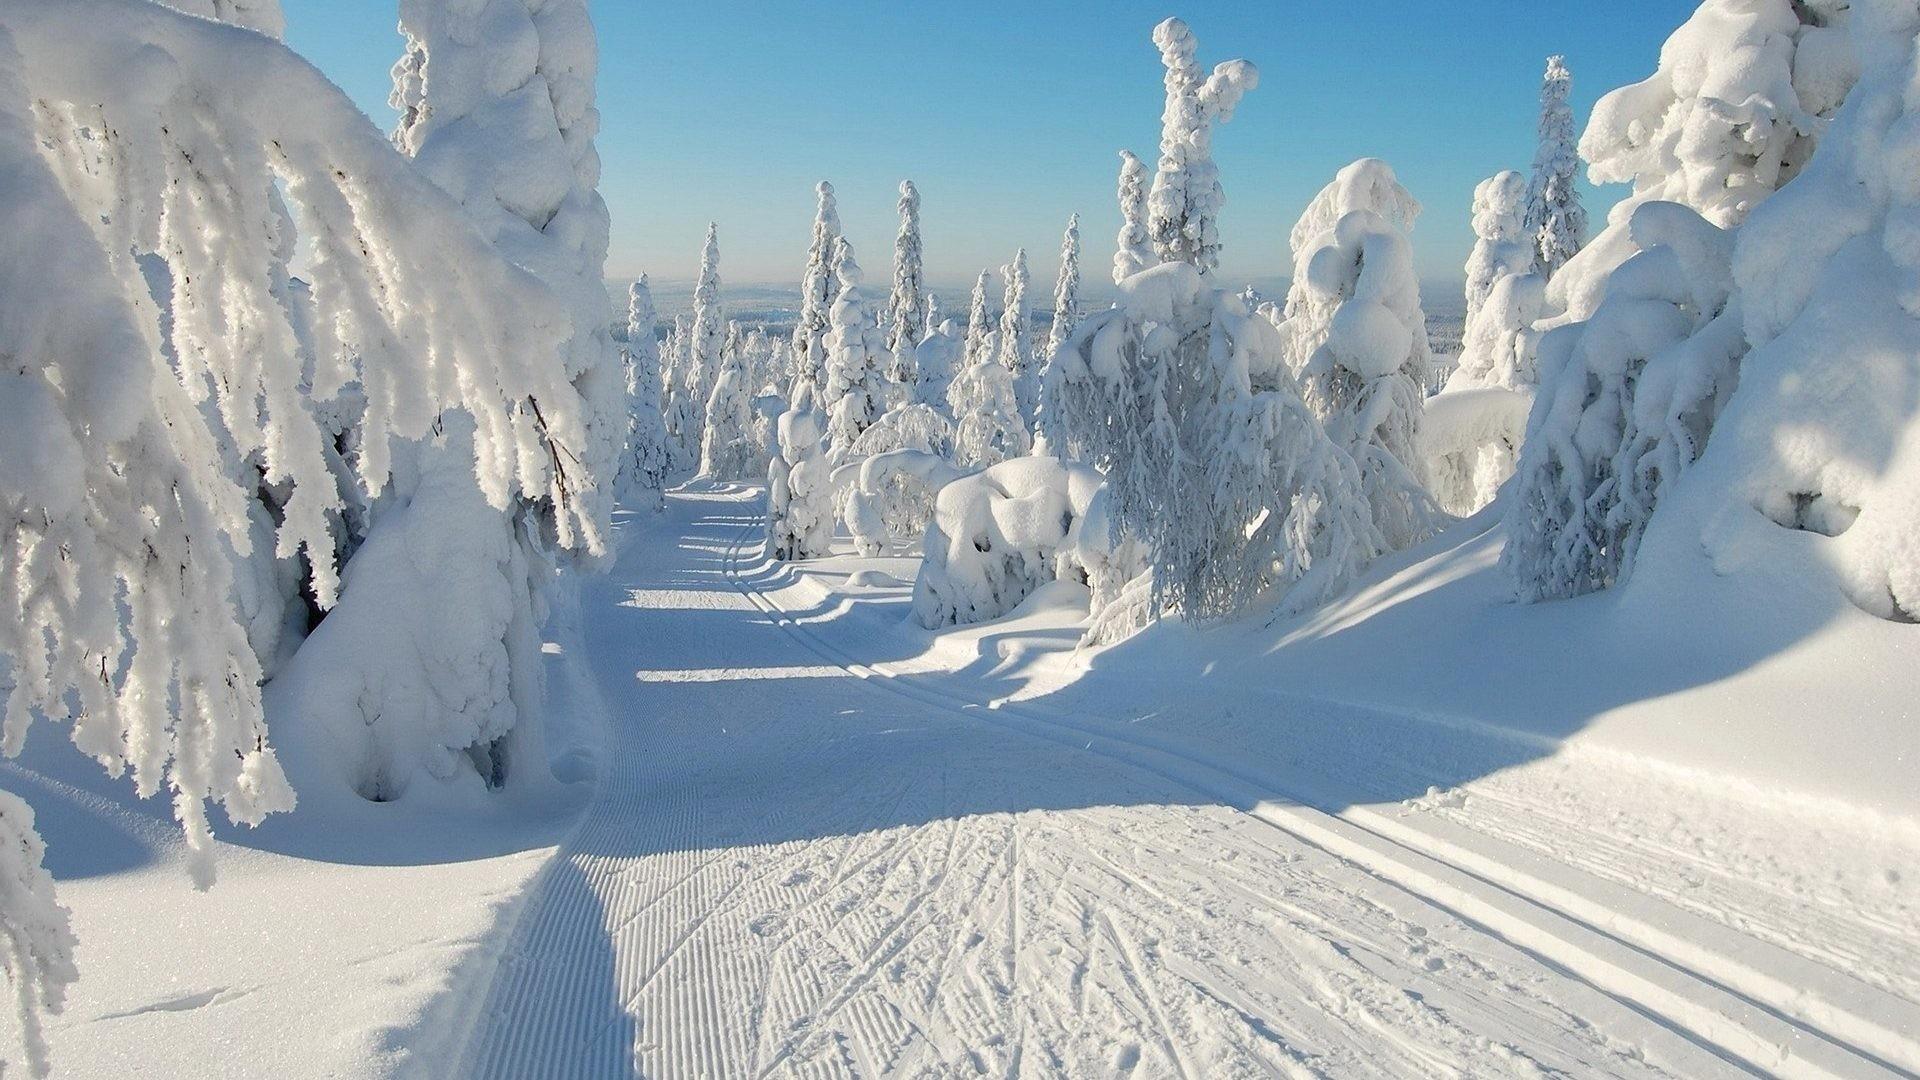 Winter – Natue Snowy Snow Scene Winter White Path Trees Desktop Wallpaper  for HD 16: